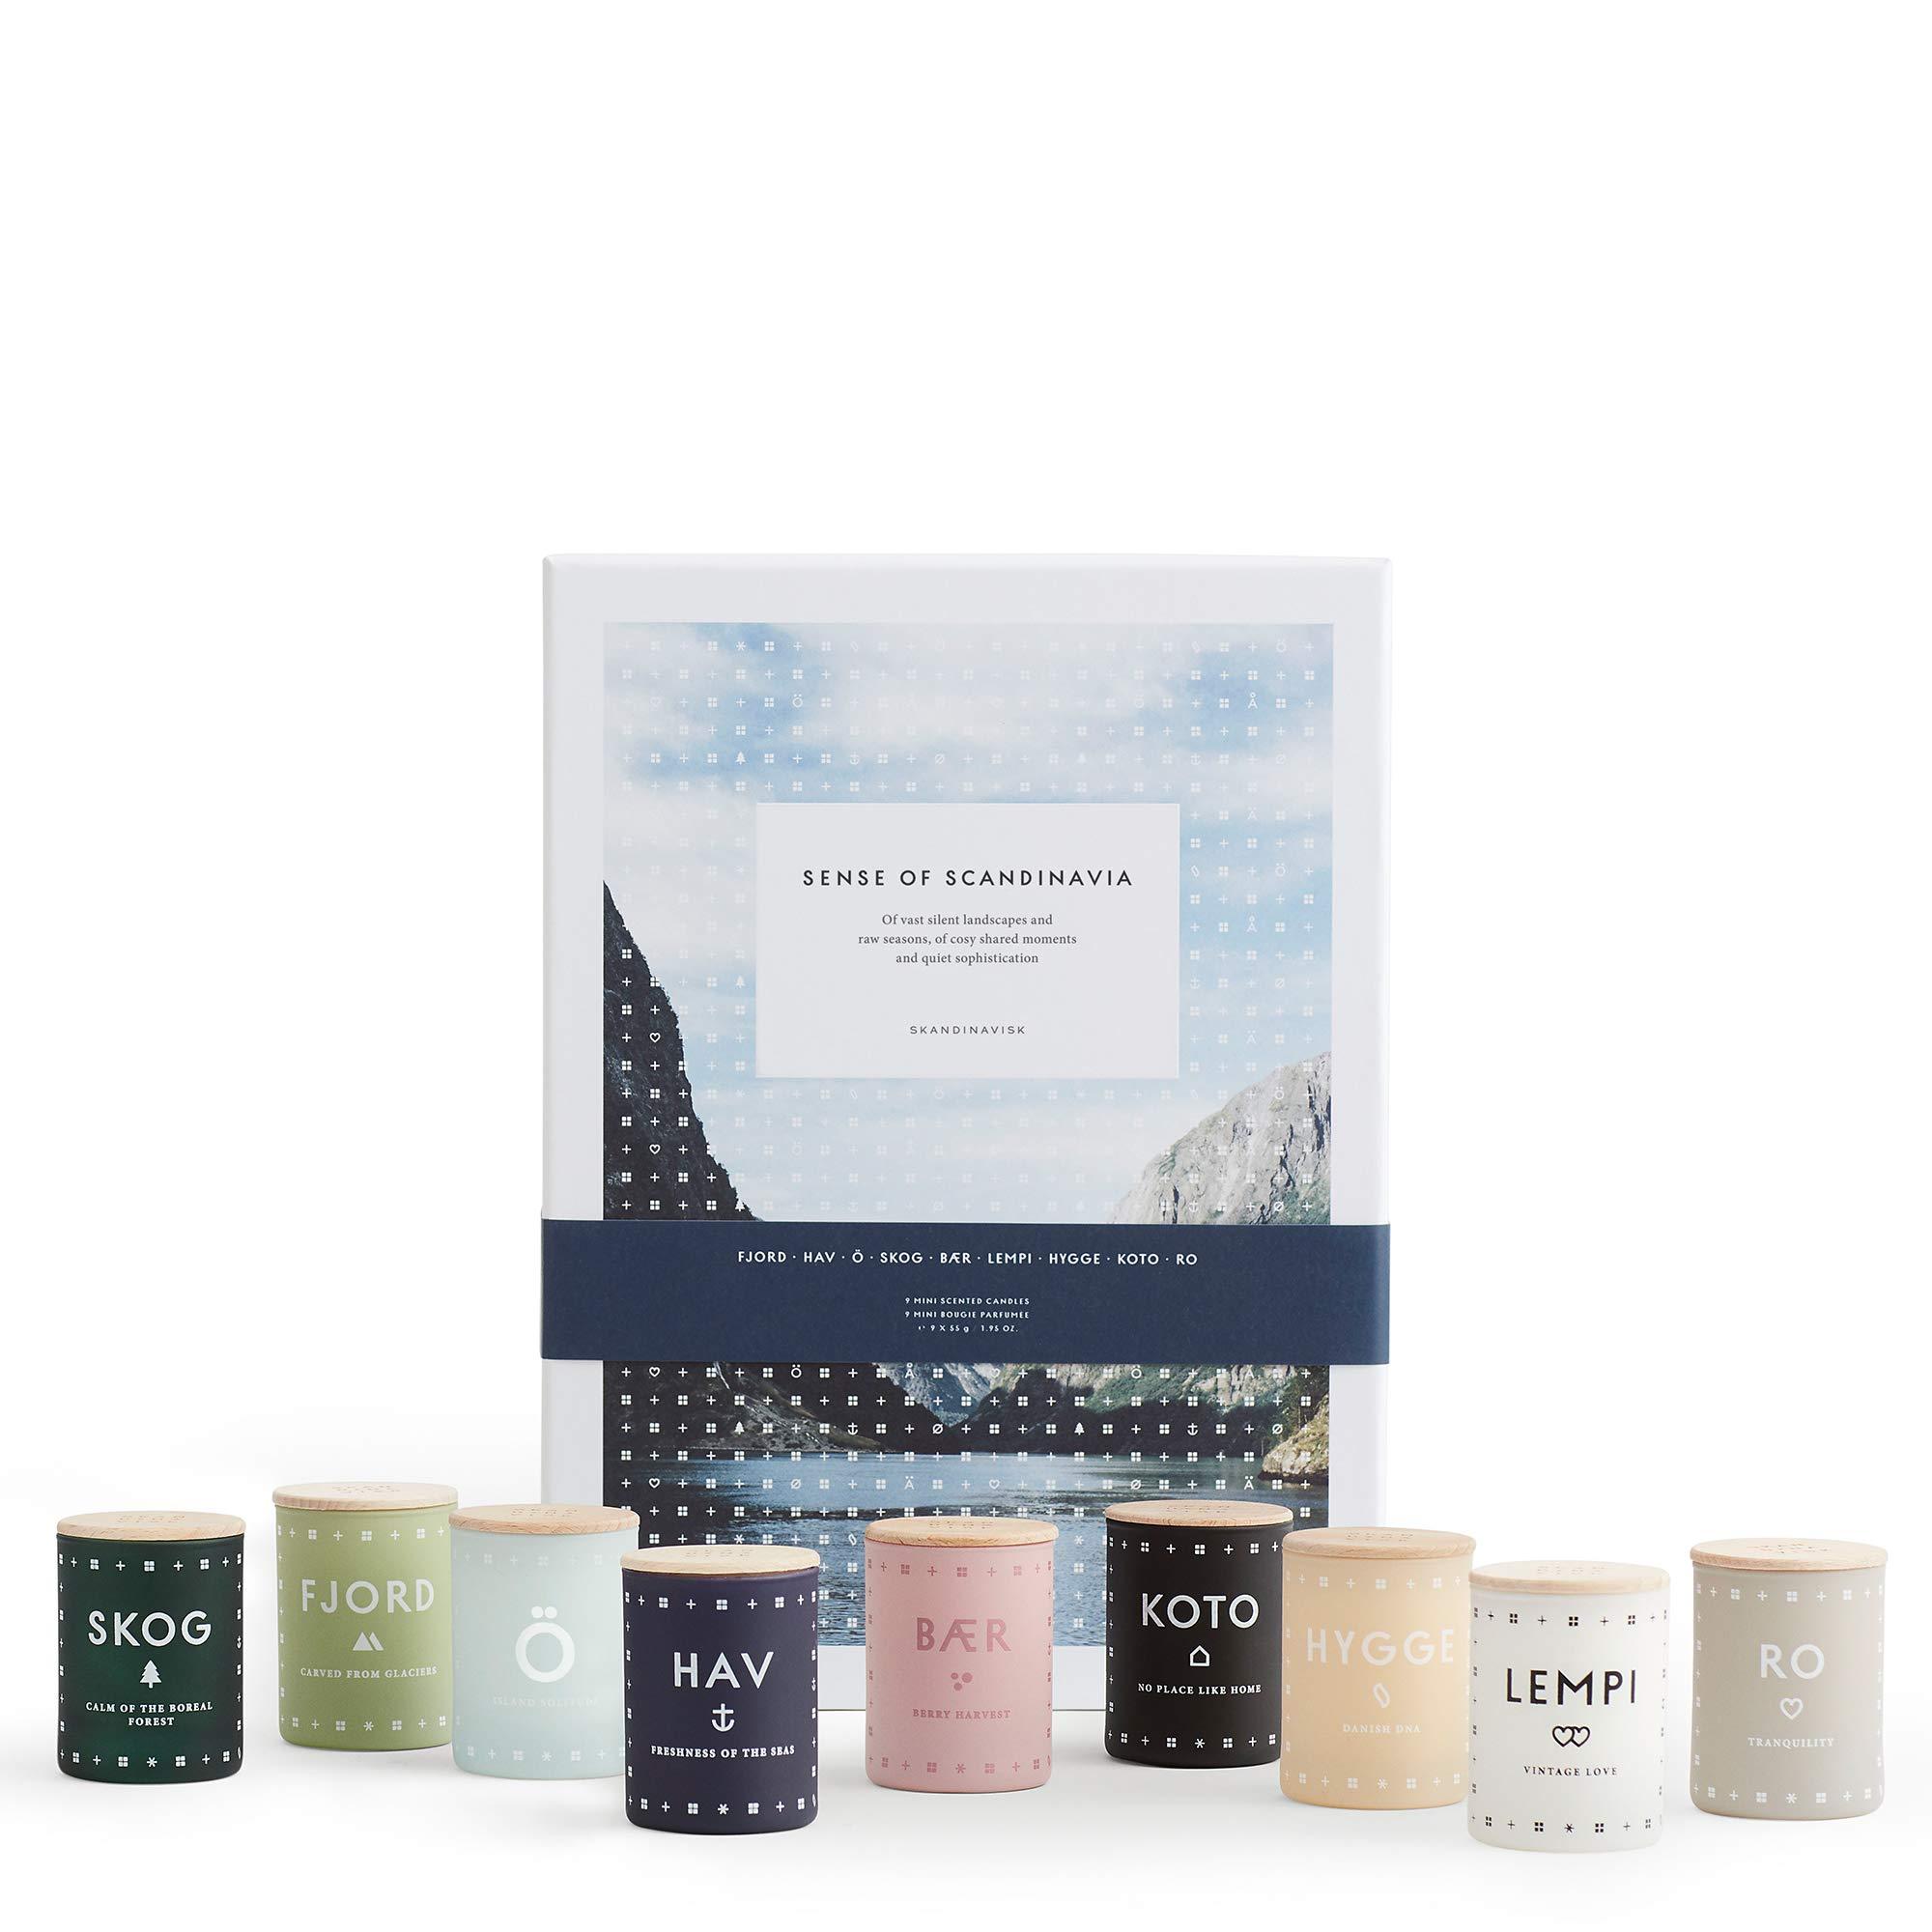 SKANDINAVISK Sense of Scandinavia Mini Candle Gift Set of 9 x 1.94 Oz